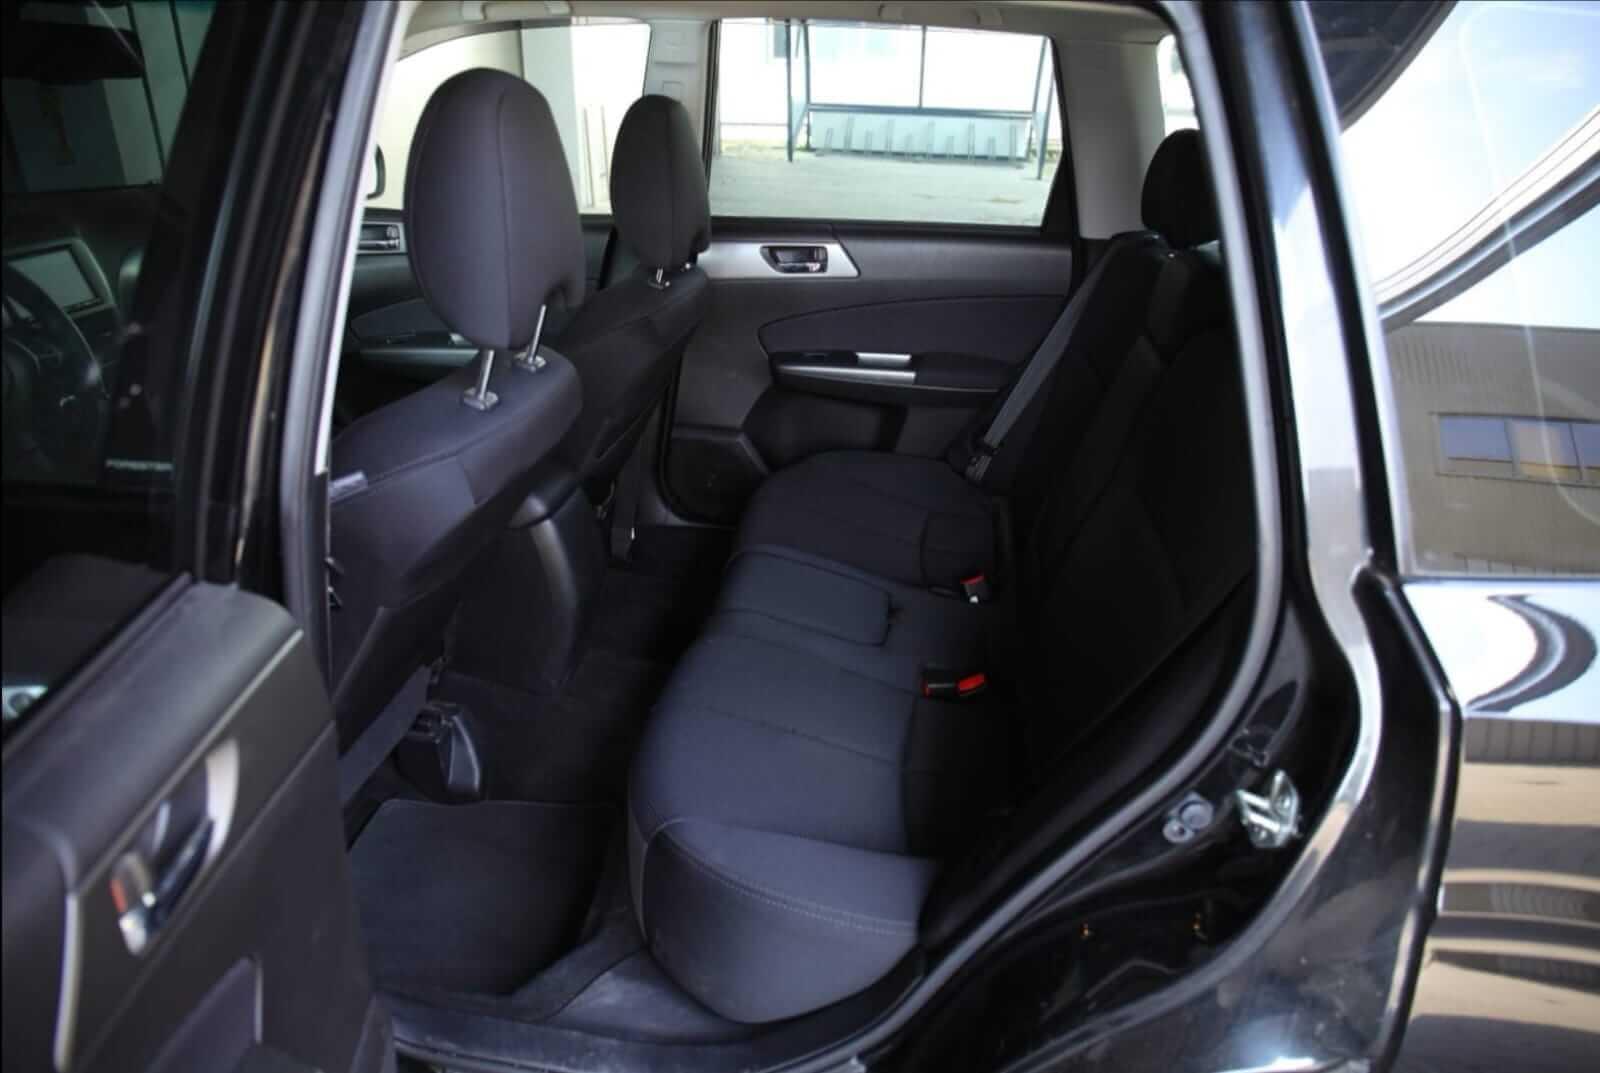 Subaru Forester front rear interior – by Next Level Automotive – Go to nextlevelautomotive.eu